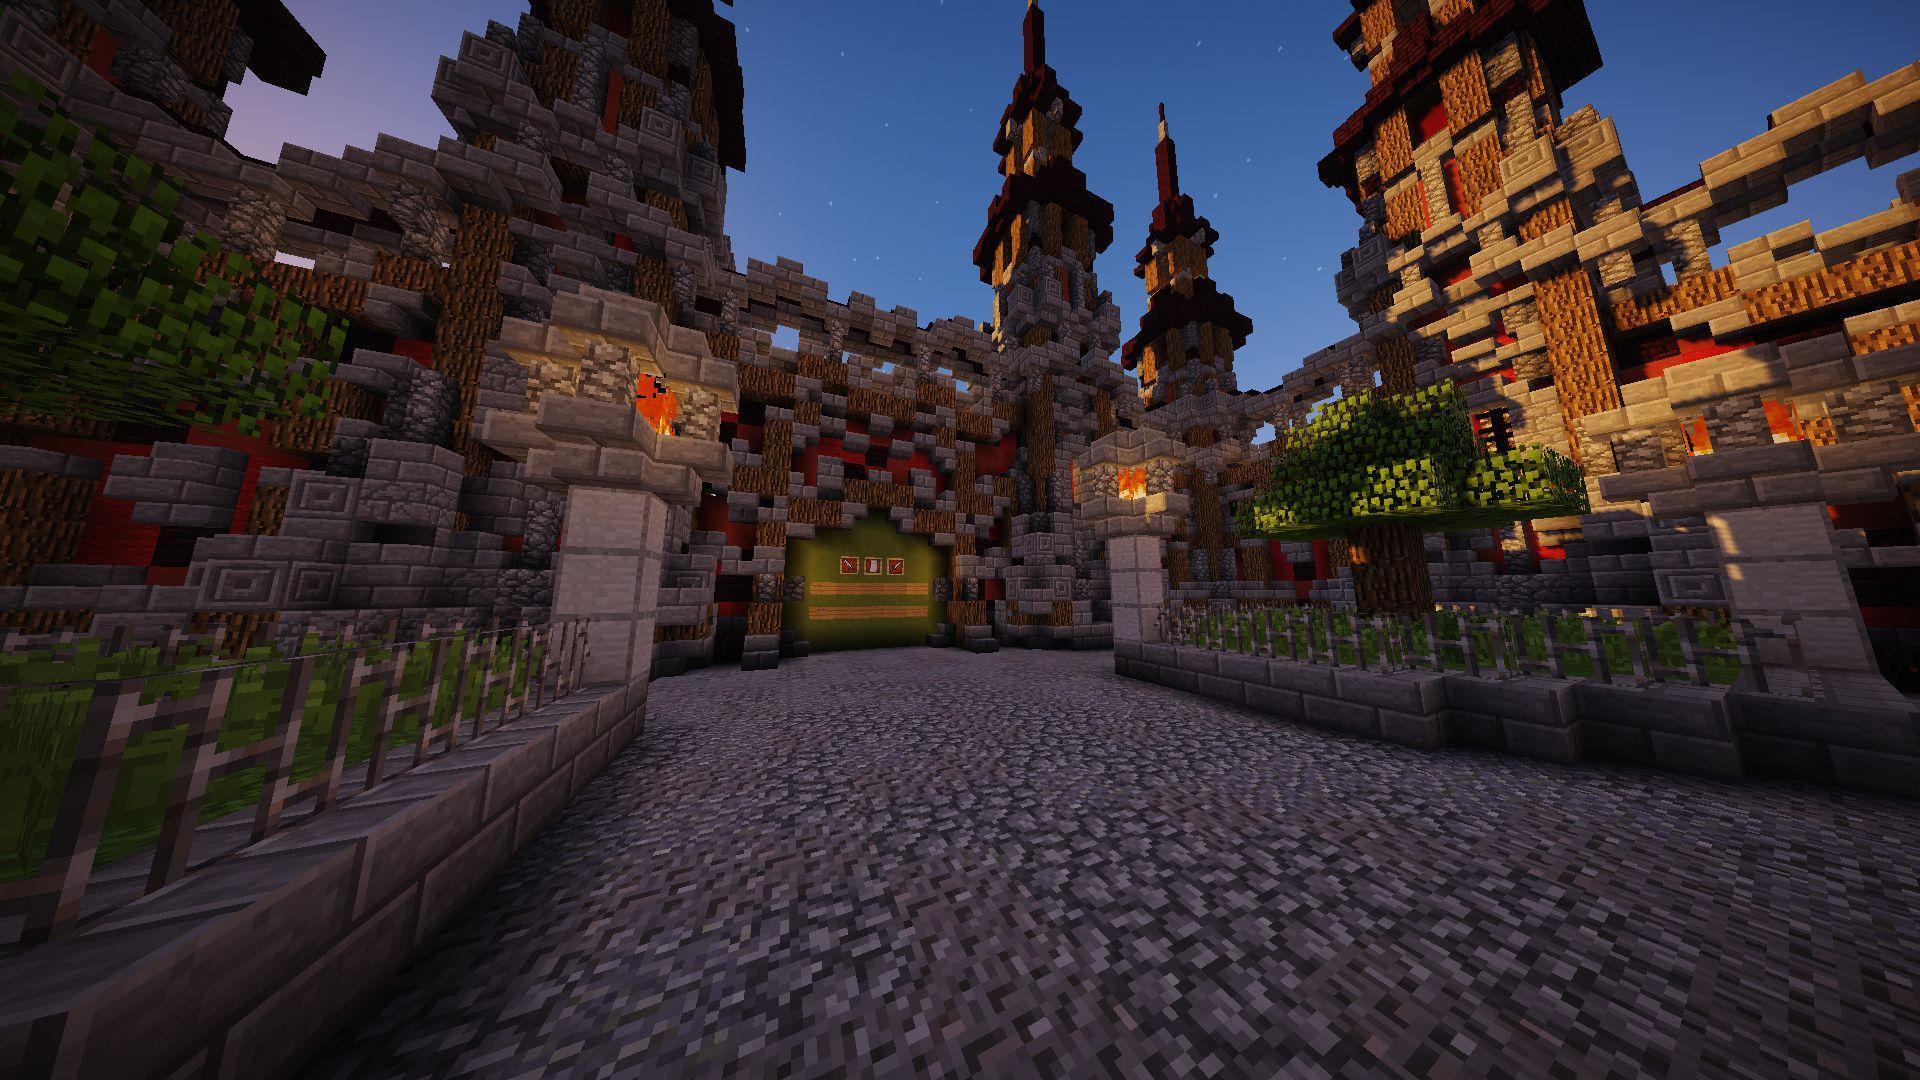 Minecraft портал, скачать клиент minecraft 1.4.6,1.4.7,1.6 ...